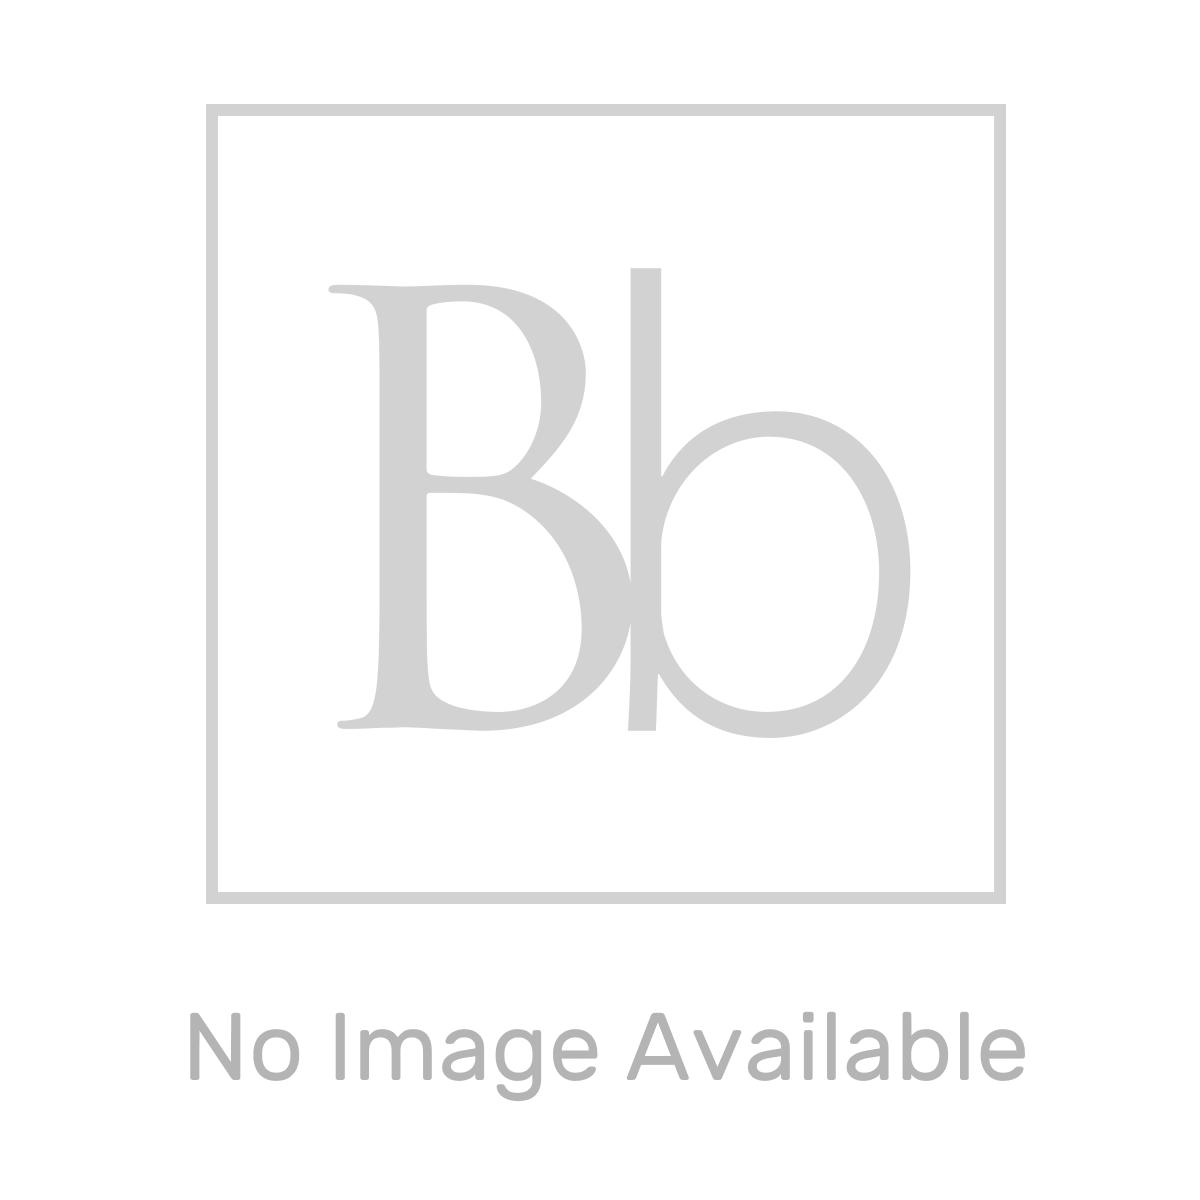 Frontline Standard Rectanglular Shower Tray 1000 x 900mm